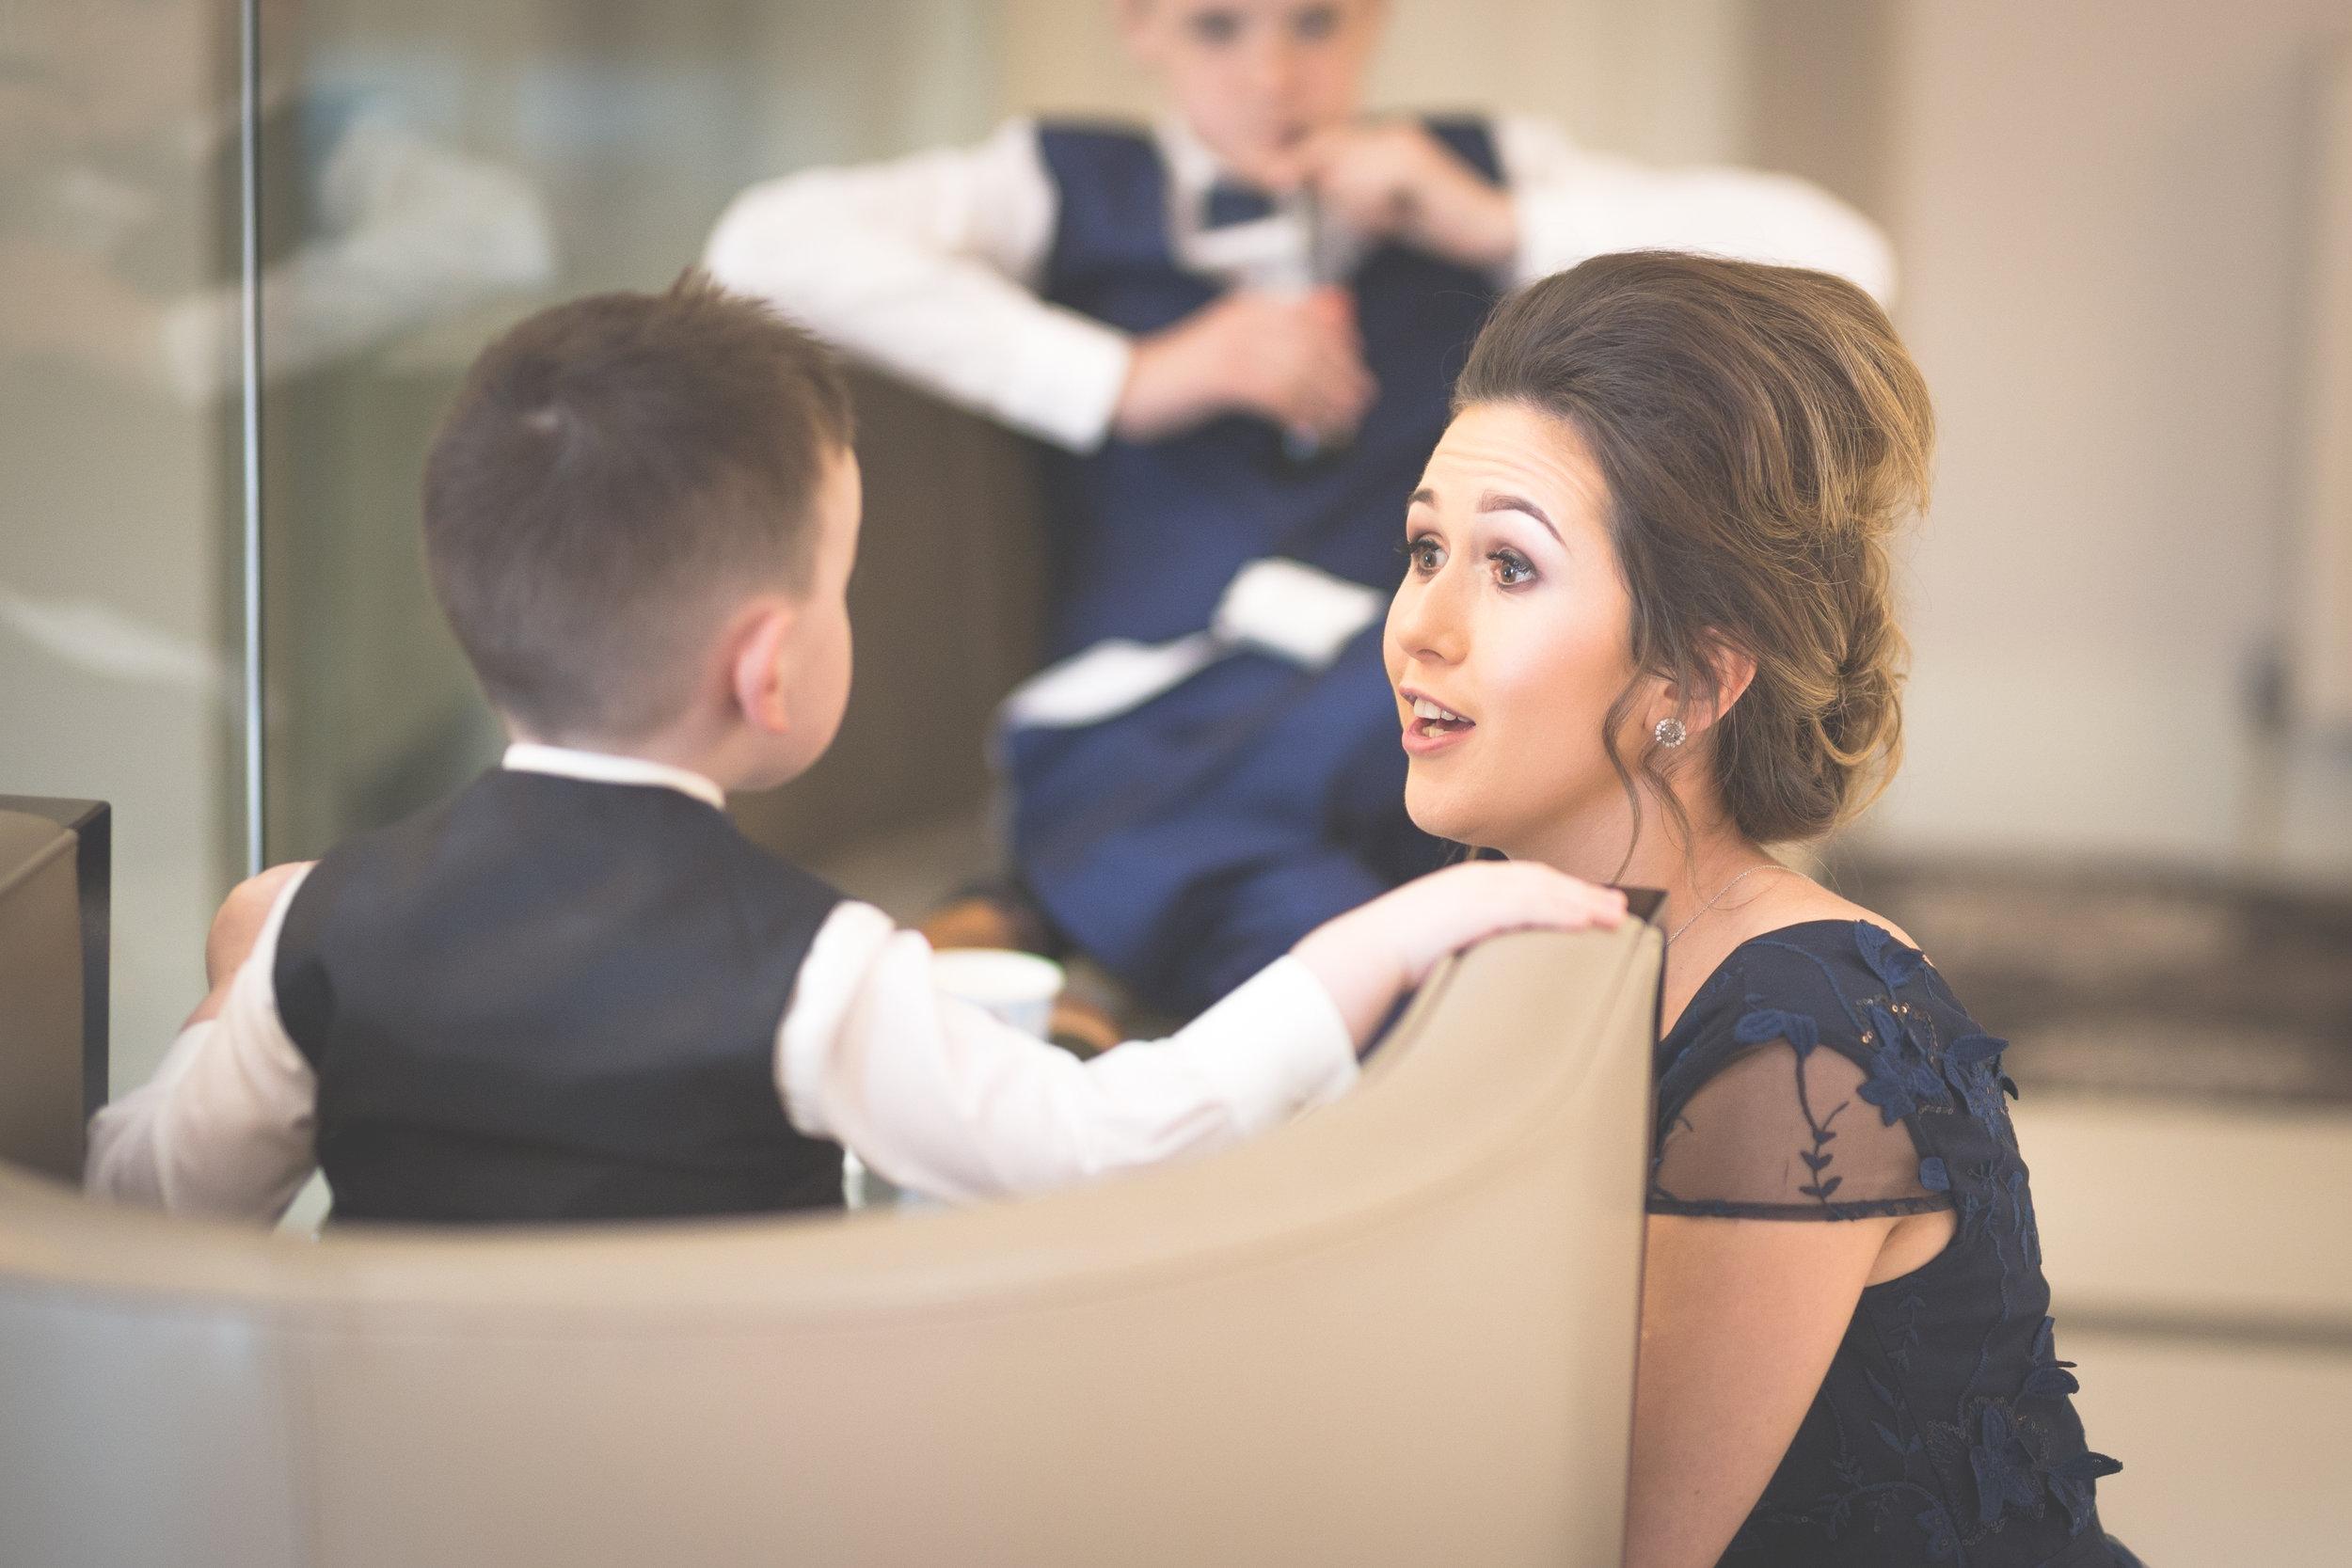 Antoinette & Stephen - Portraits   Brian McEwan Photography   Wedding Photographer Northern Ireland 113.jpg